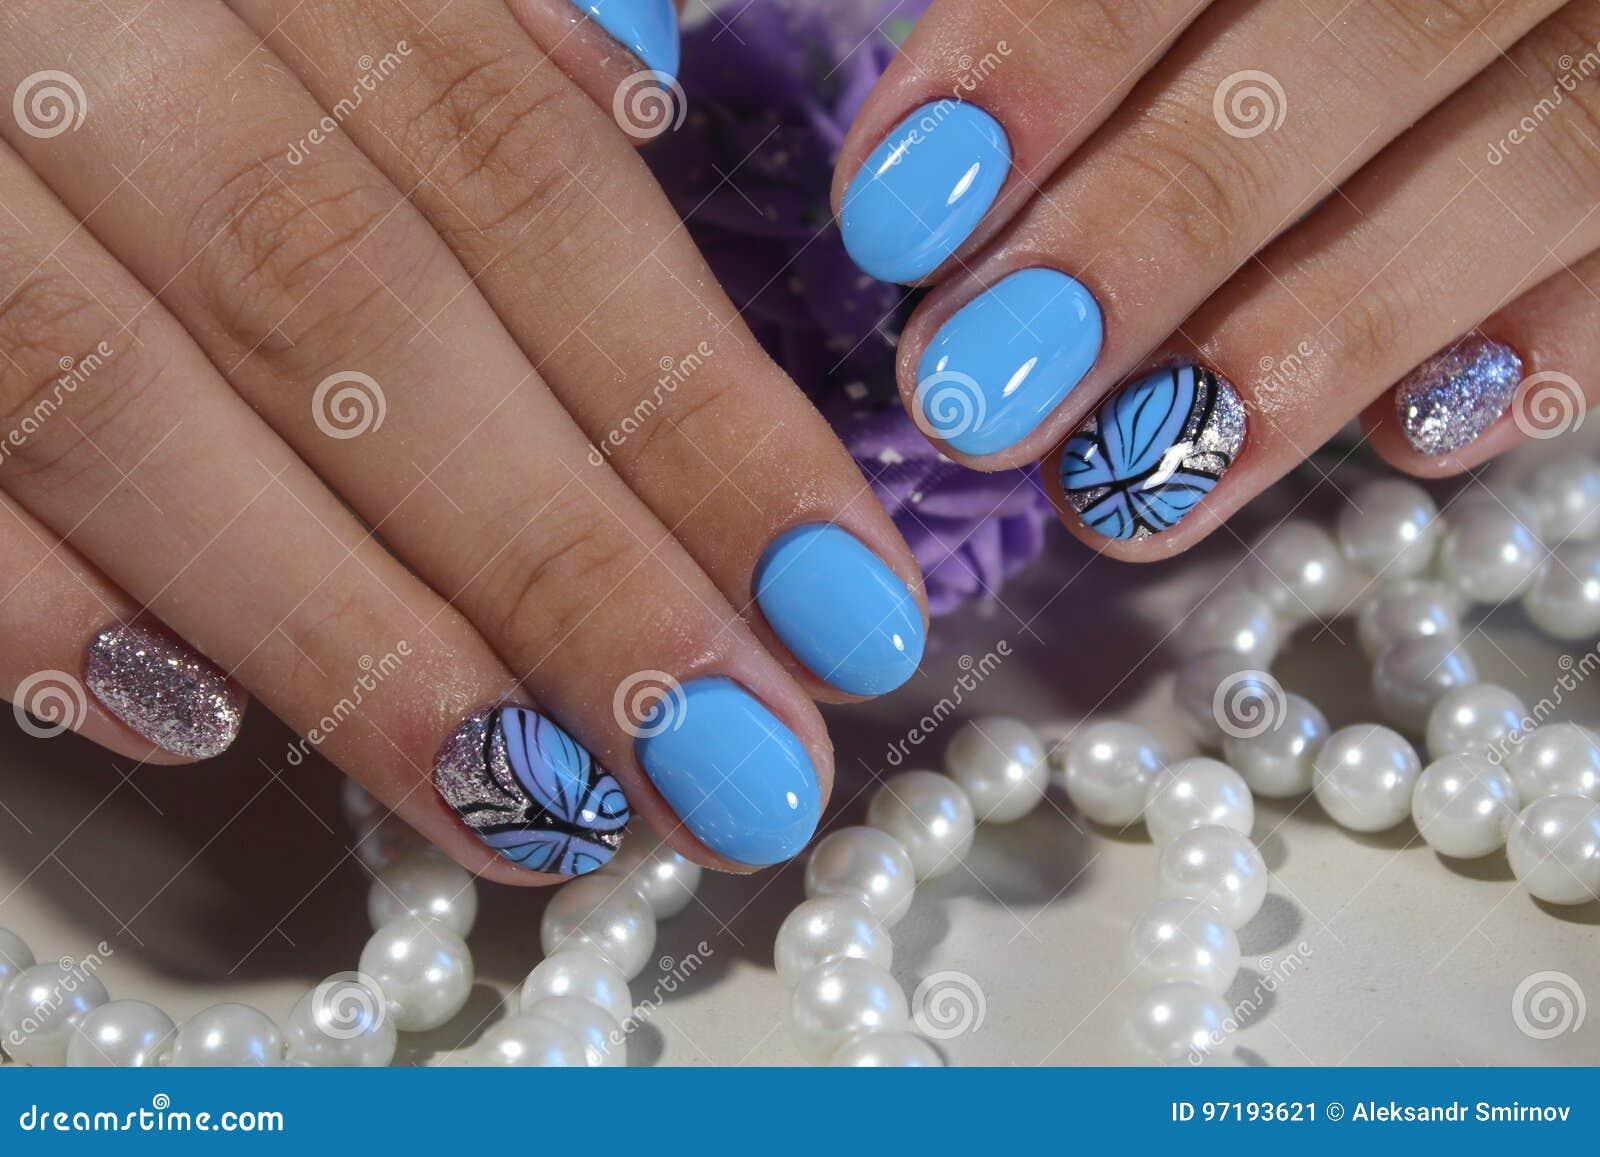 Manicure Design Nail Polish Gel Stock Image Image Of Hand